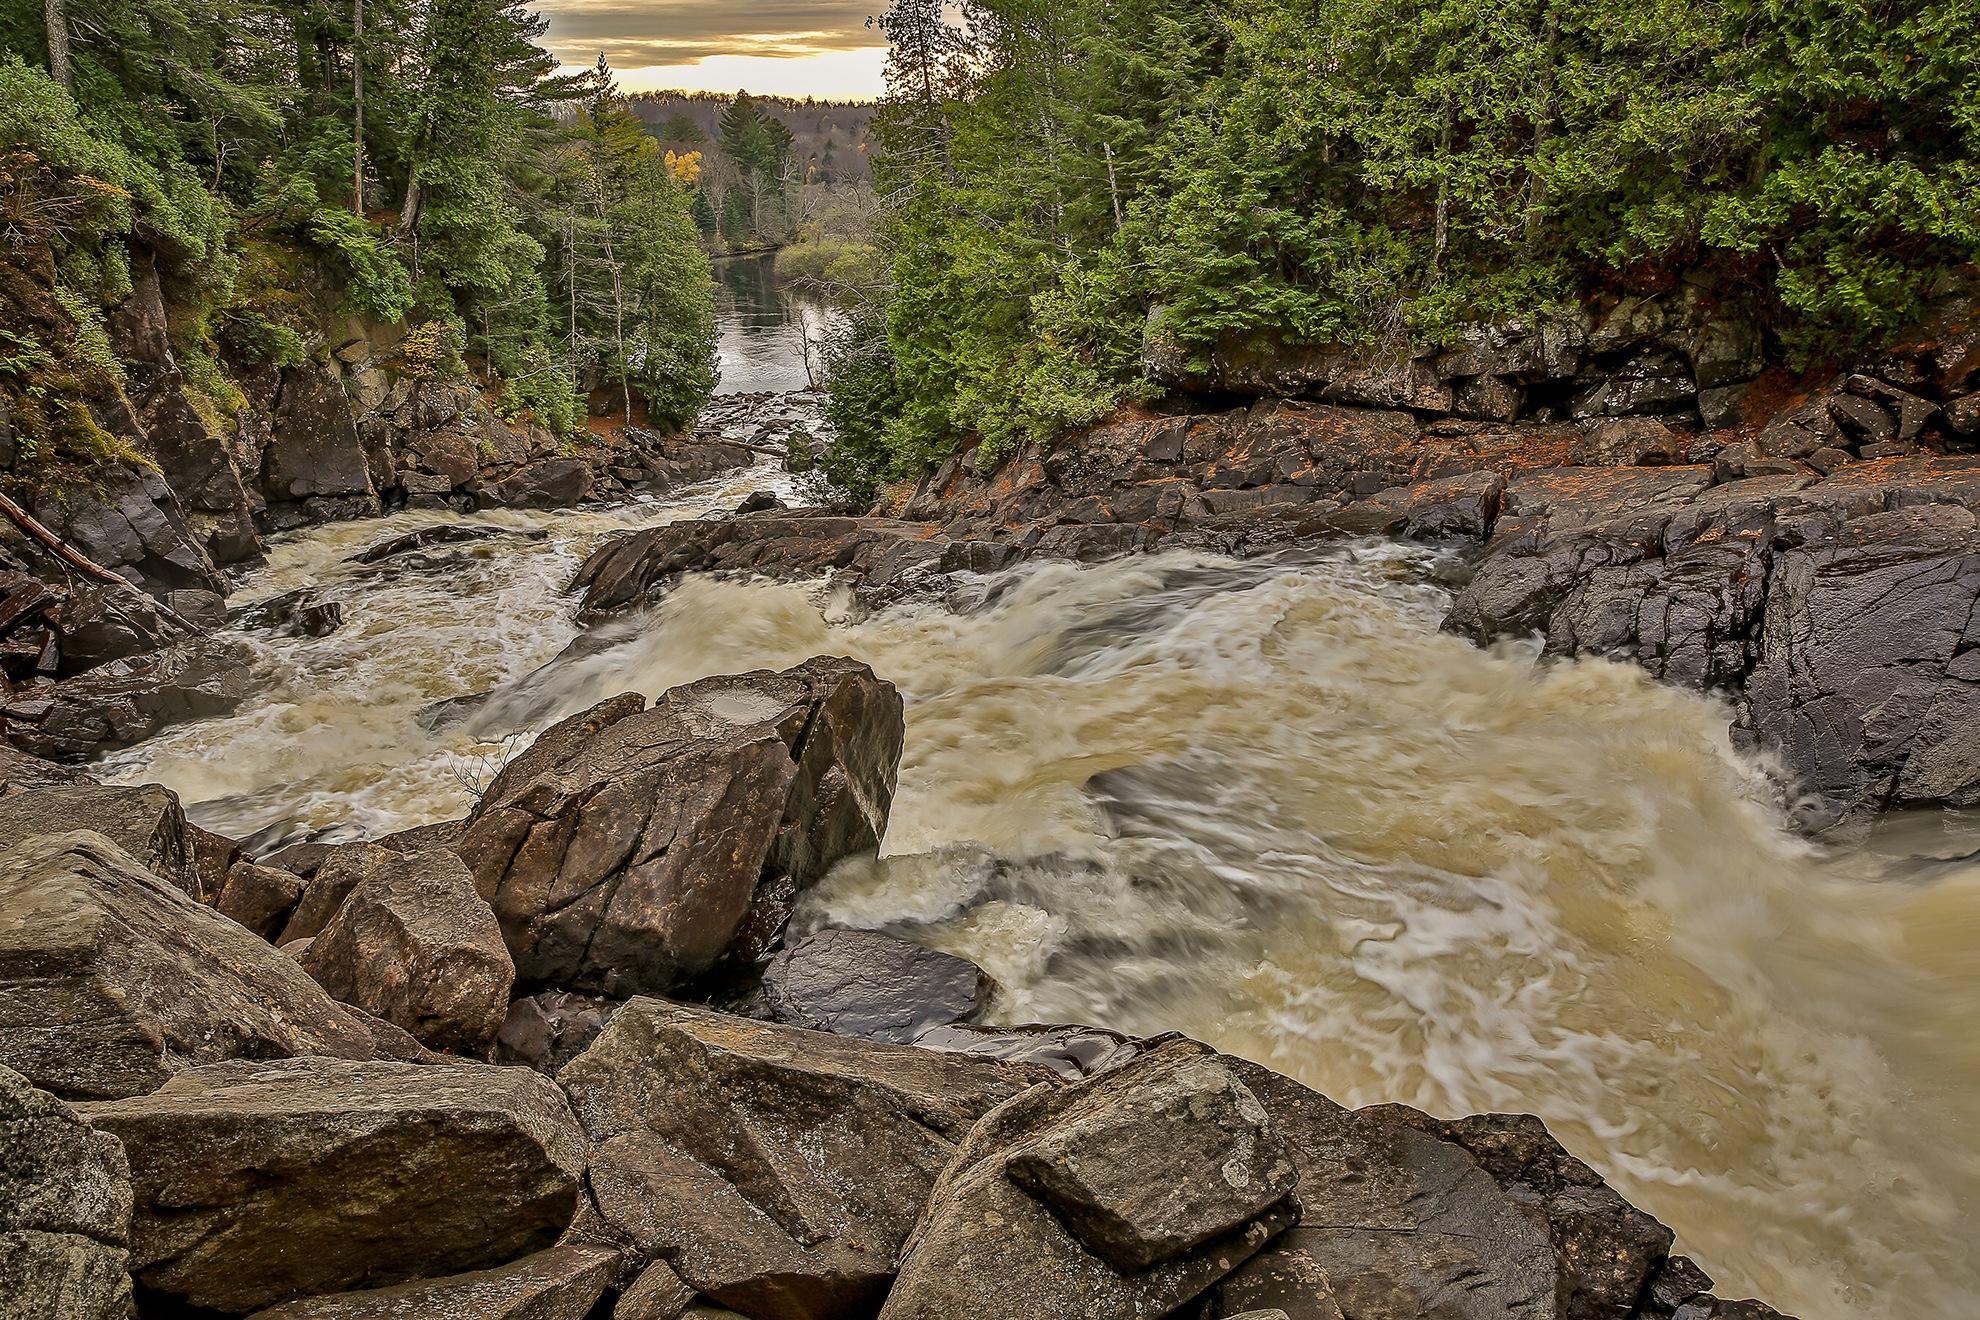 Ragged Falls by Steve Dunsford